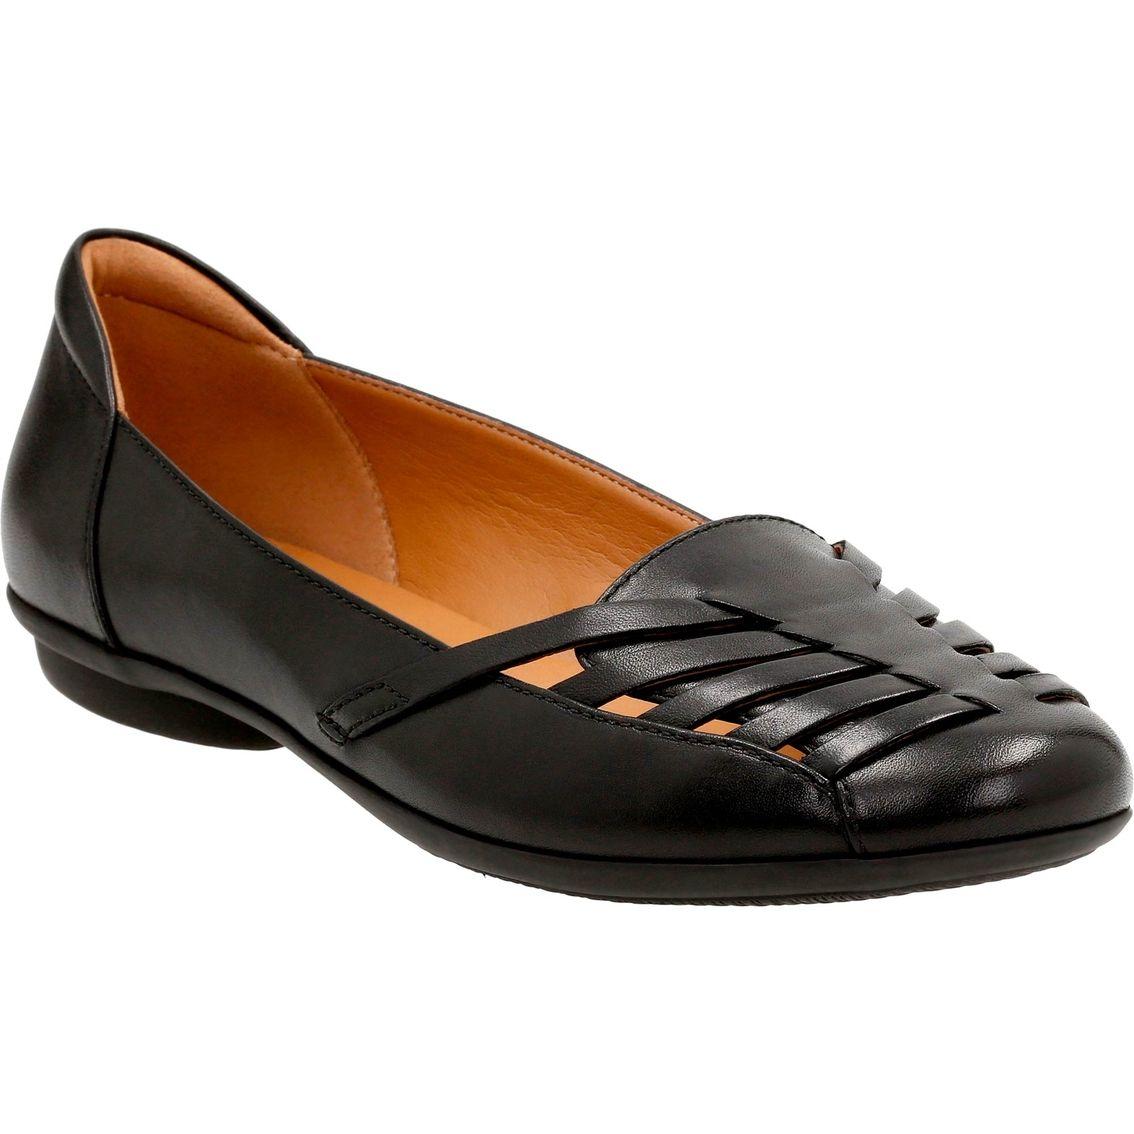 e73904f310fe Clarks Women s Gracelin Gemma Comfort Slip On Shoes